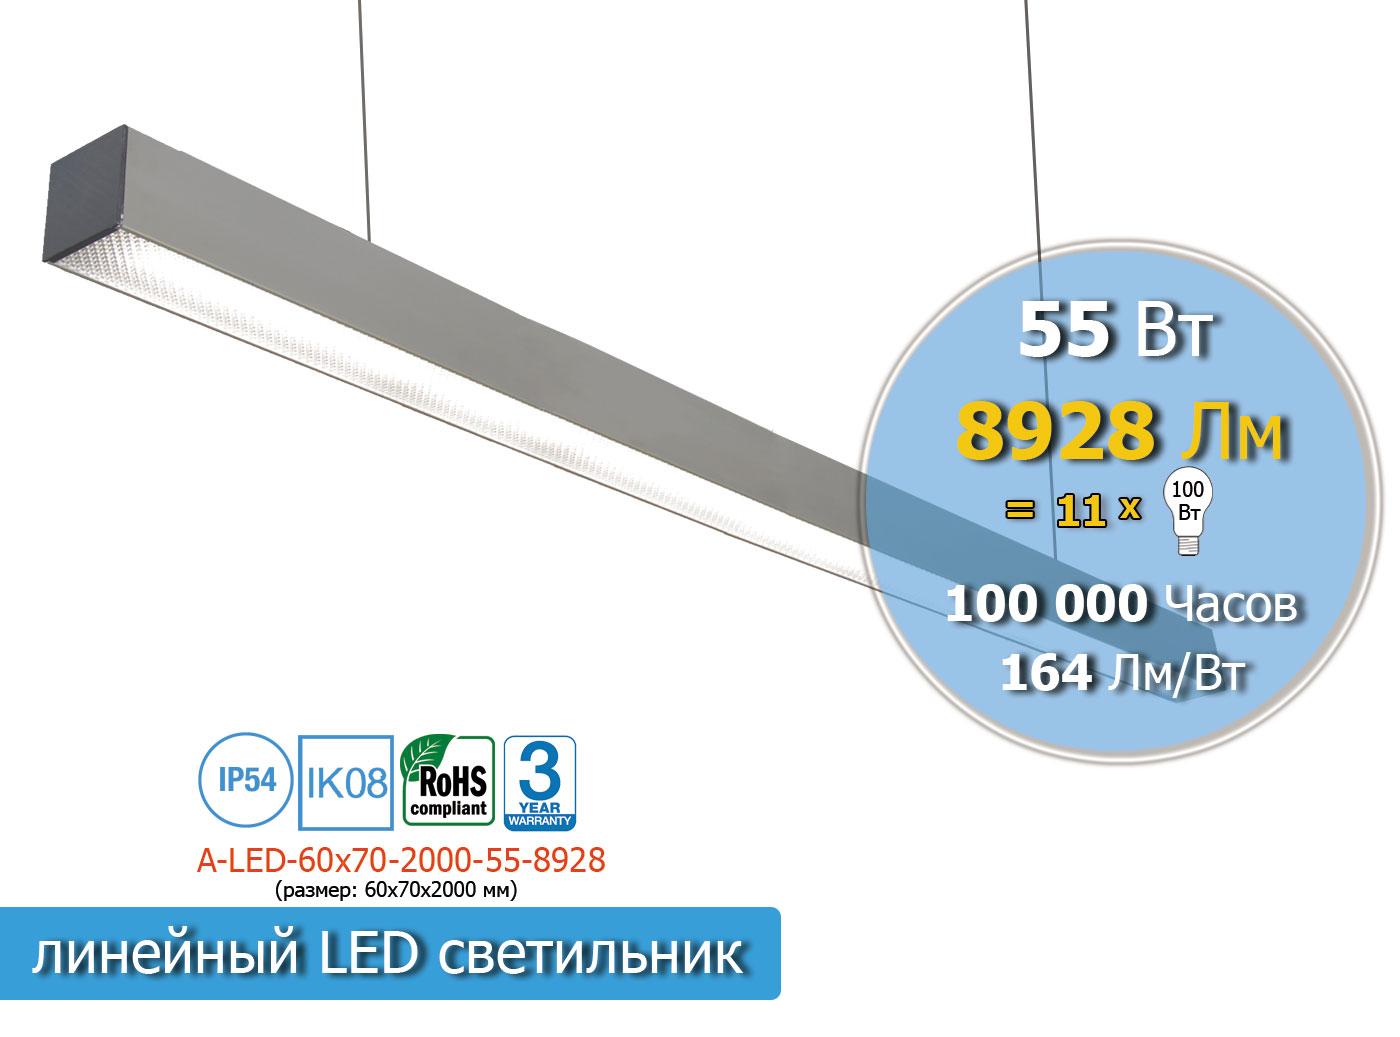 A-LED-60х70-2000-55-8928